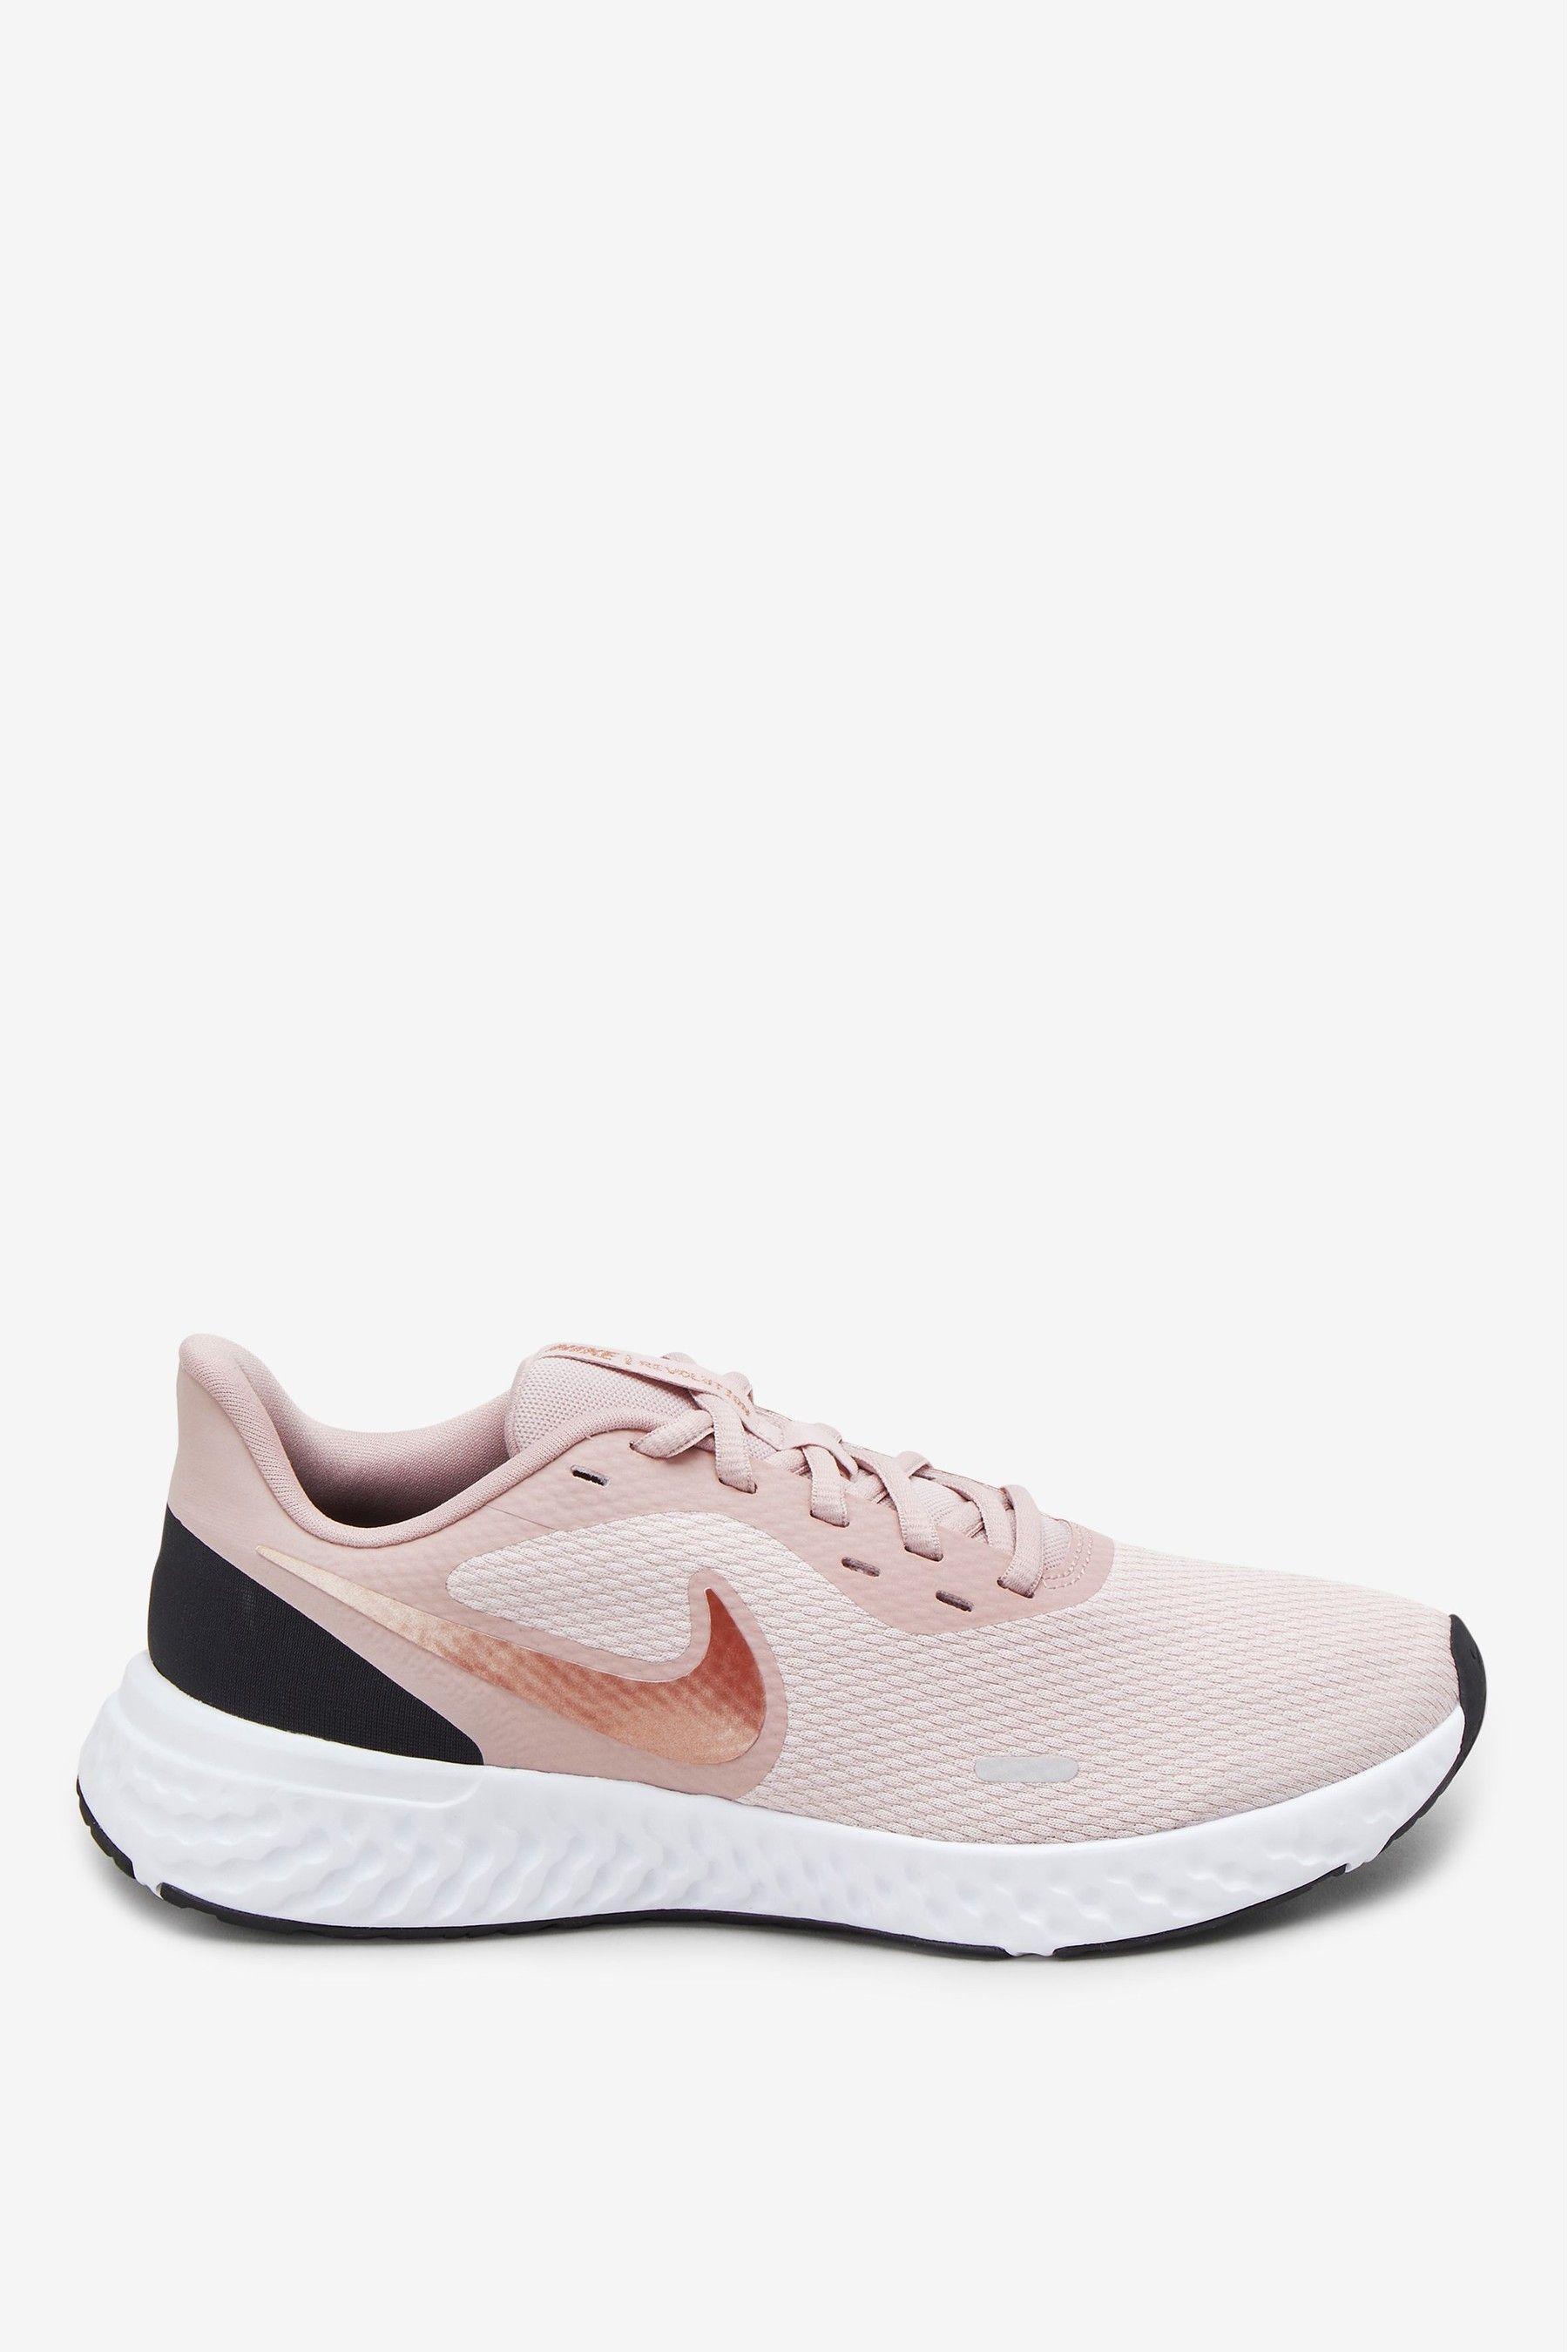 Ecología Enciclopedia motor  Buy Nike Run Revolution 5 Trainers from the Next UK online shop | Nike  women, Nike, Trainers women